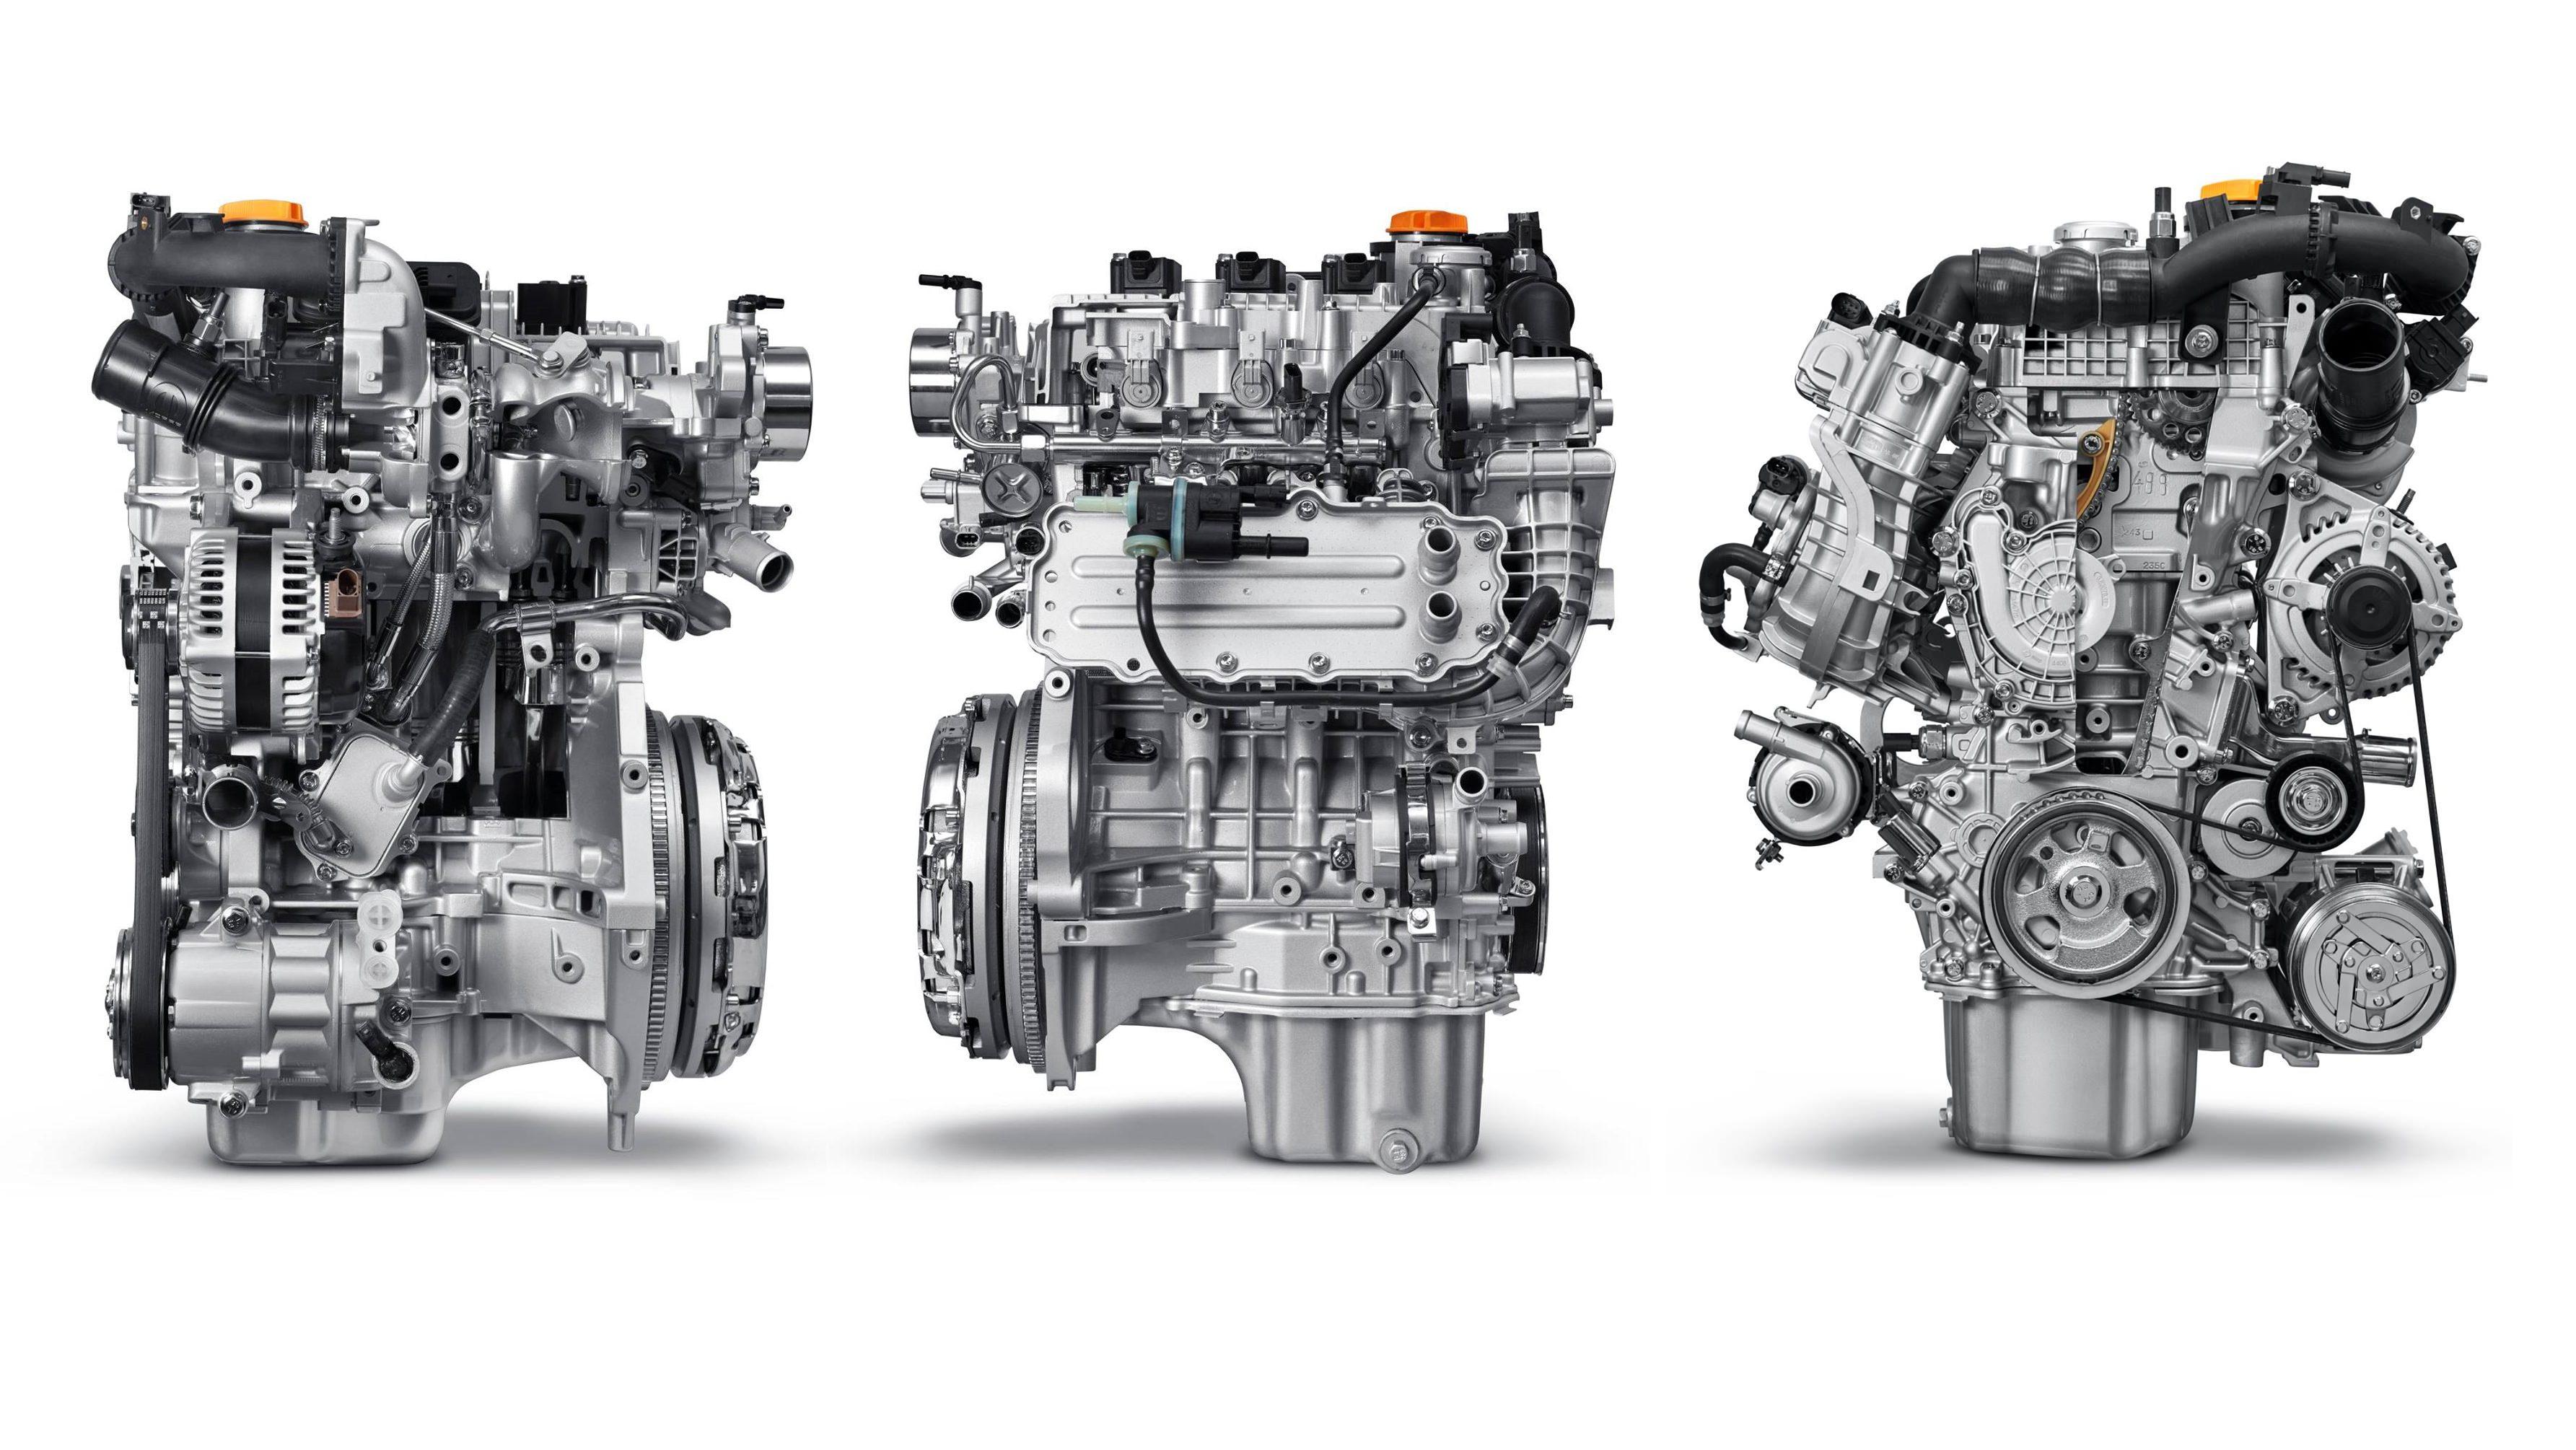 Motor-GSE-T3-1.0-Turbo 2